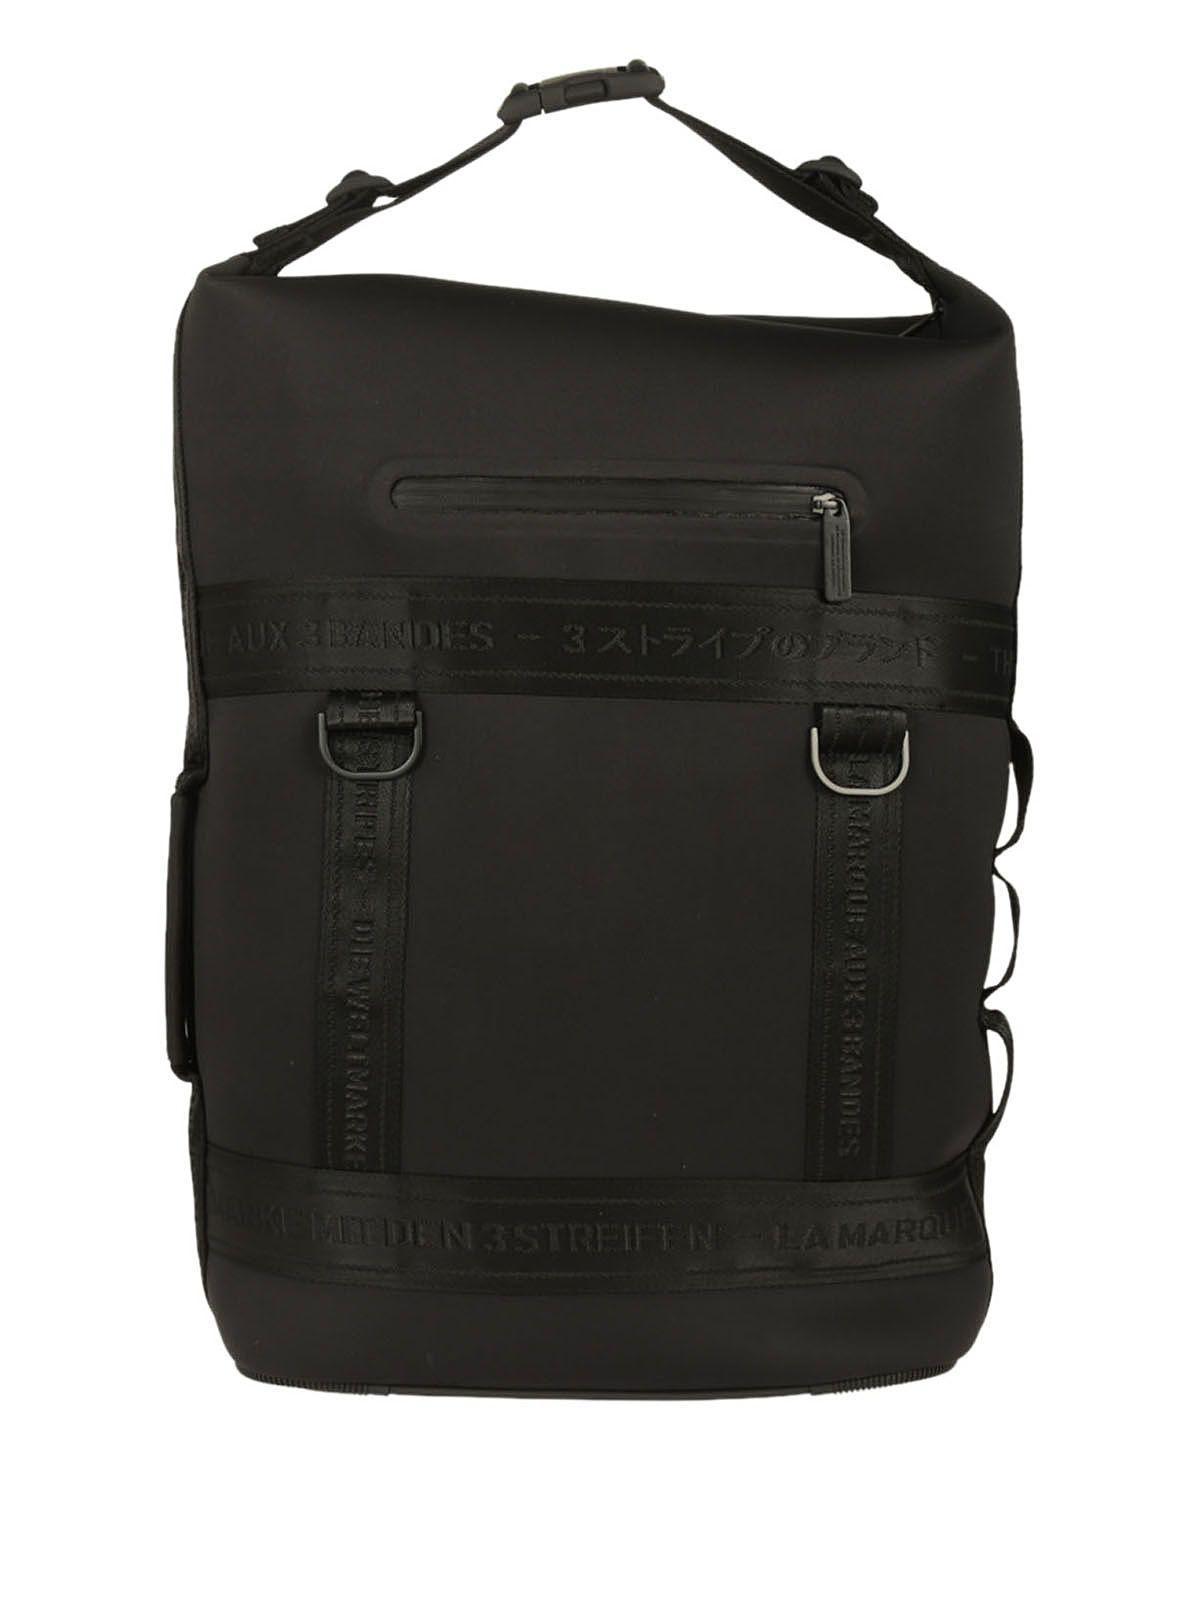 Adidas Originals Night Backpack In Black